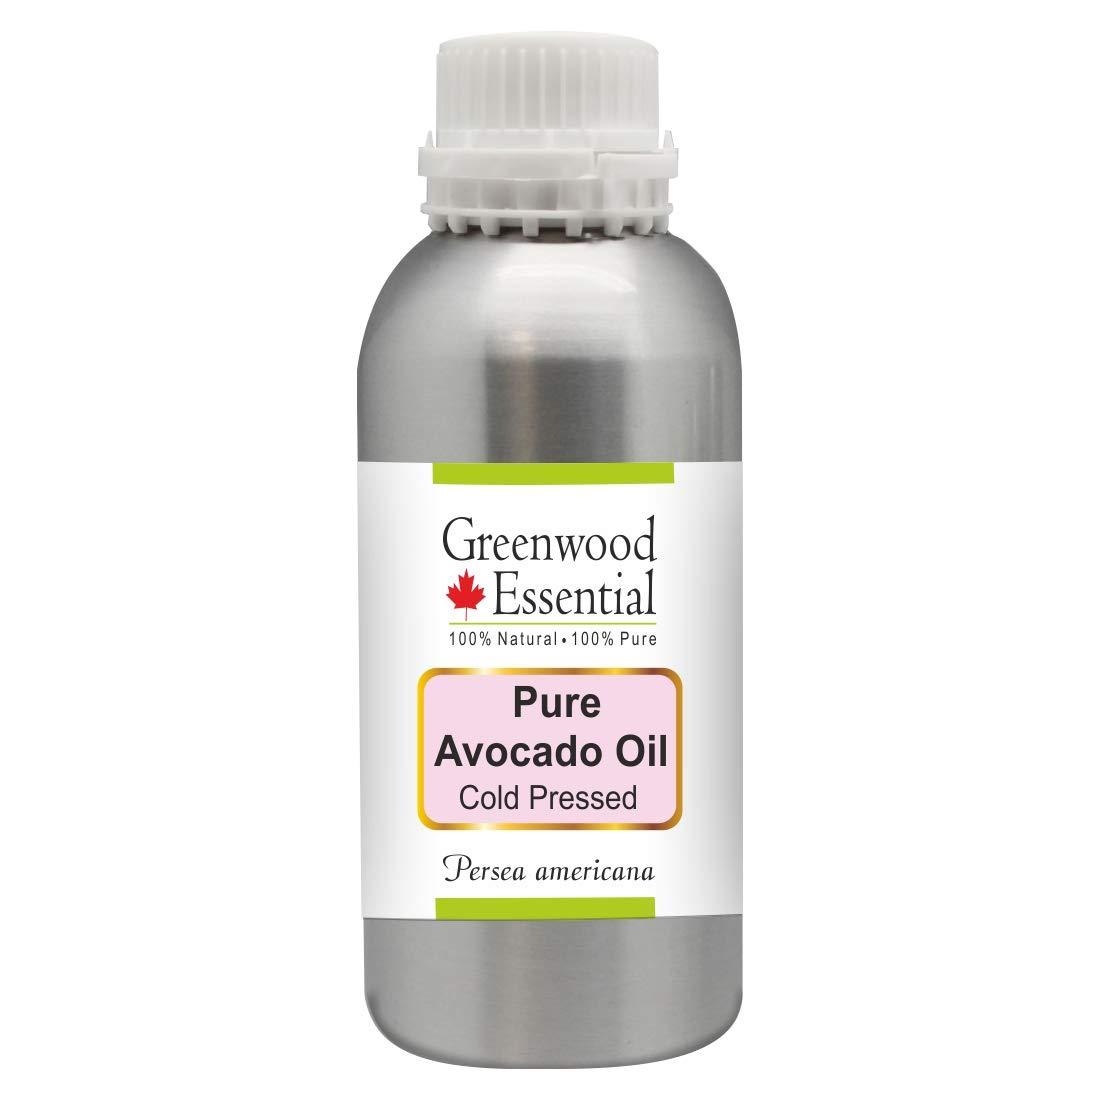 Greenwood Essential Pure Avocado Oil (Persea americana) Premium Therapeutic Grade for Hair, Skin 1250ml (42 oz)